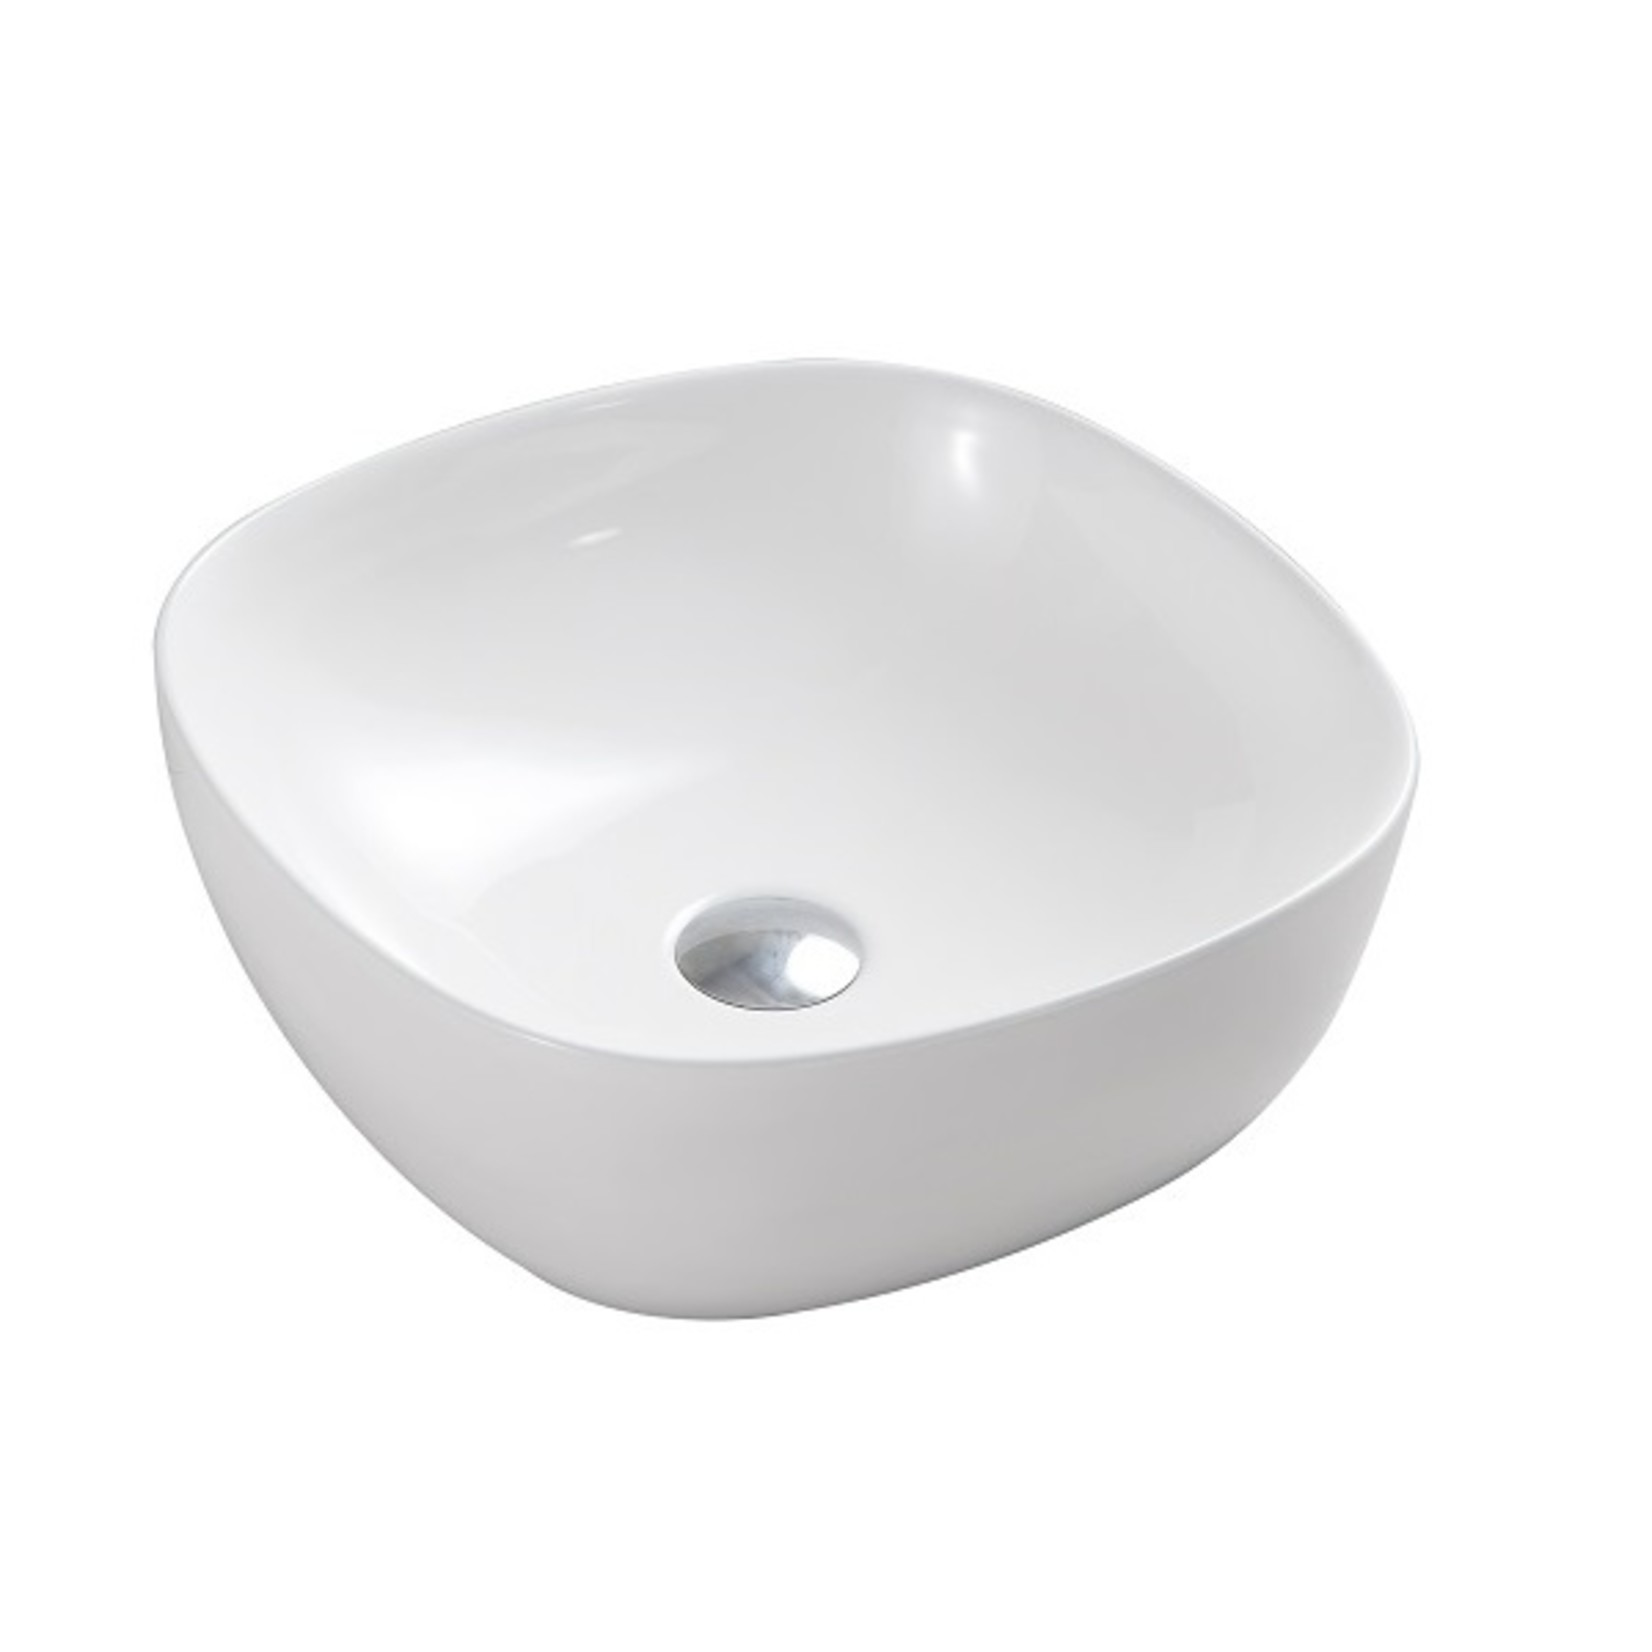 16 '' white porcelain sink MI-1268-1